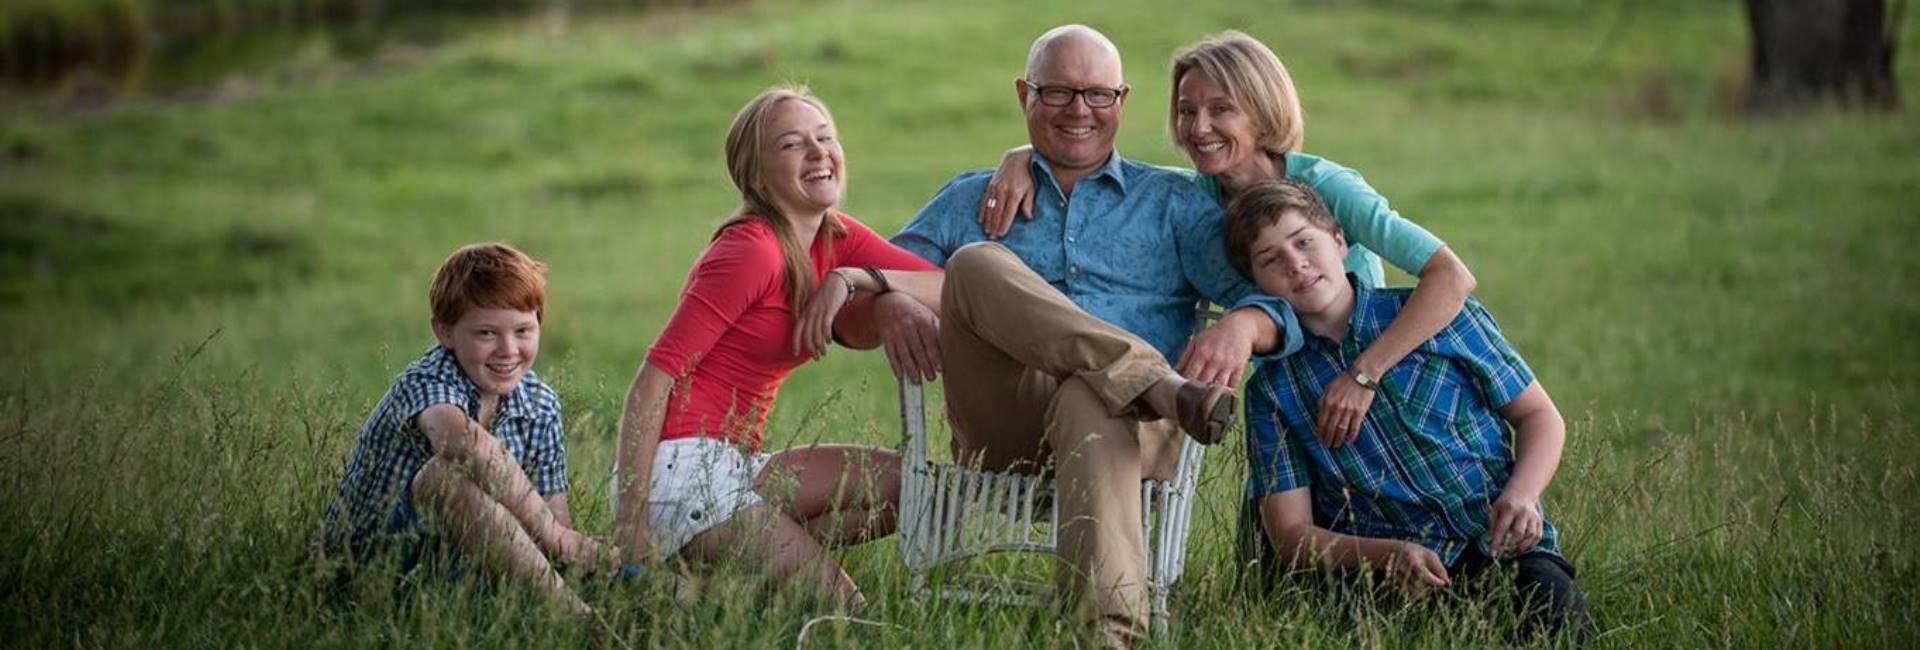 macansh-family